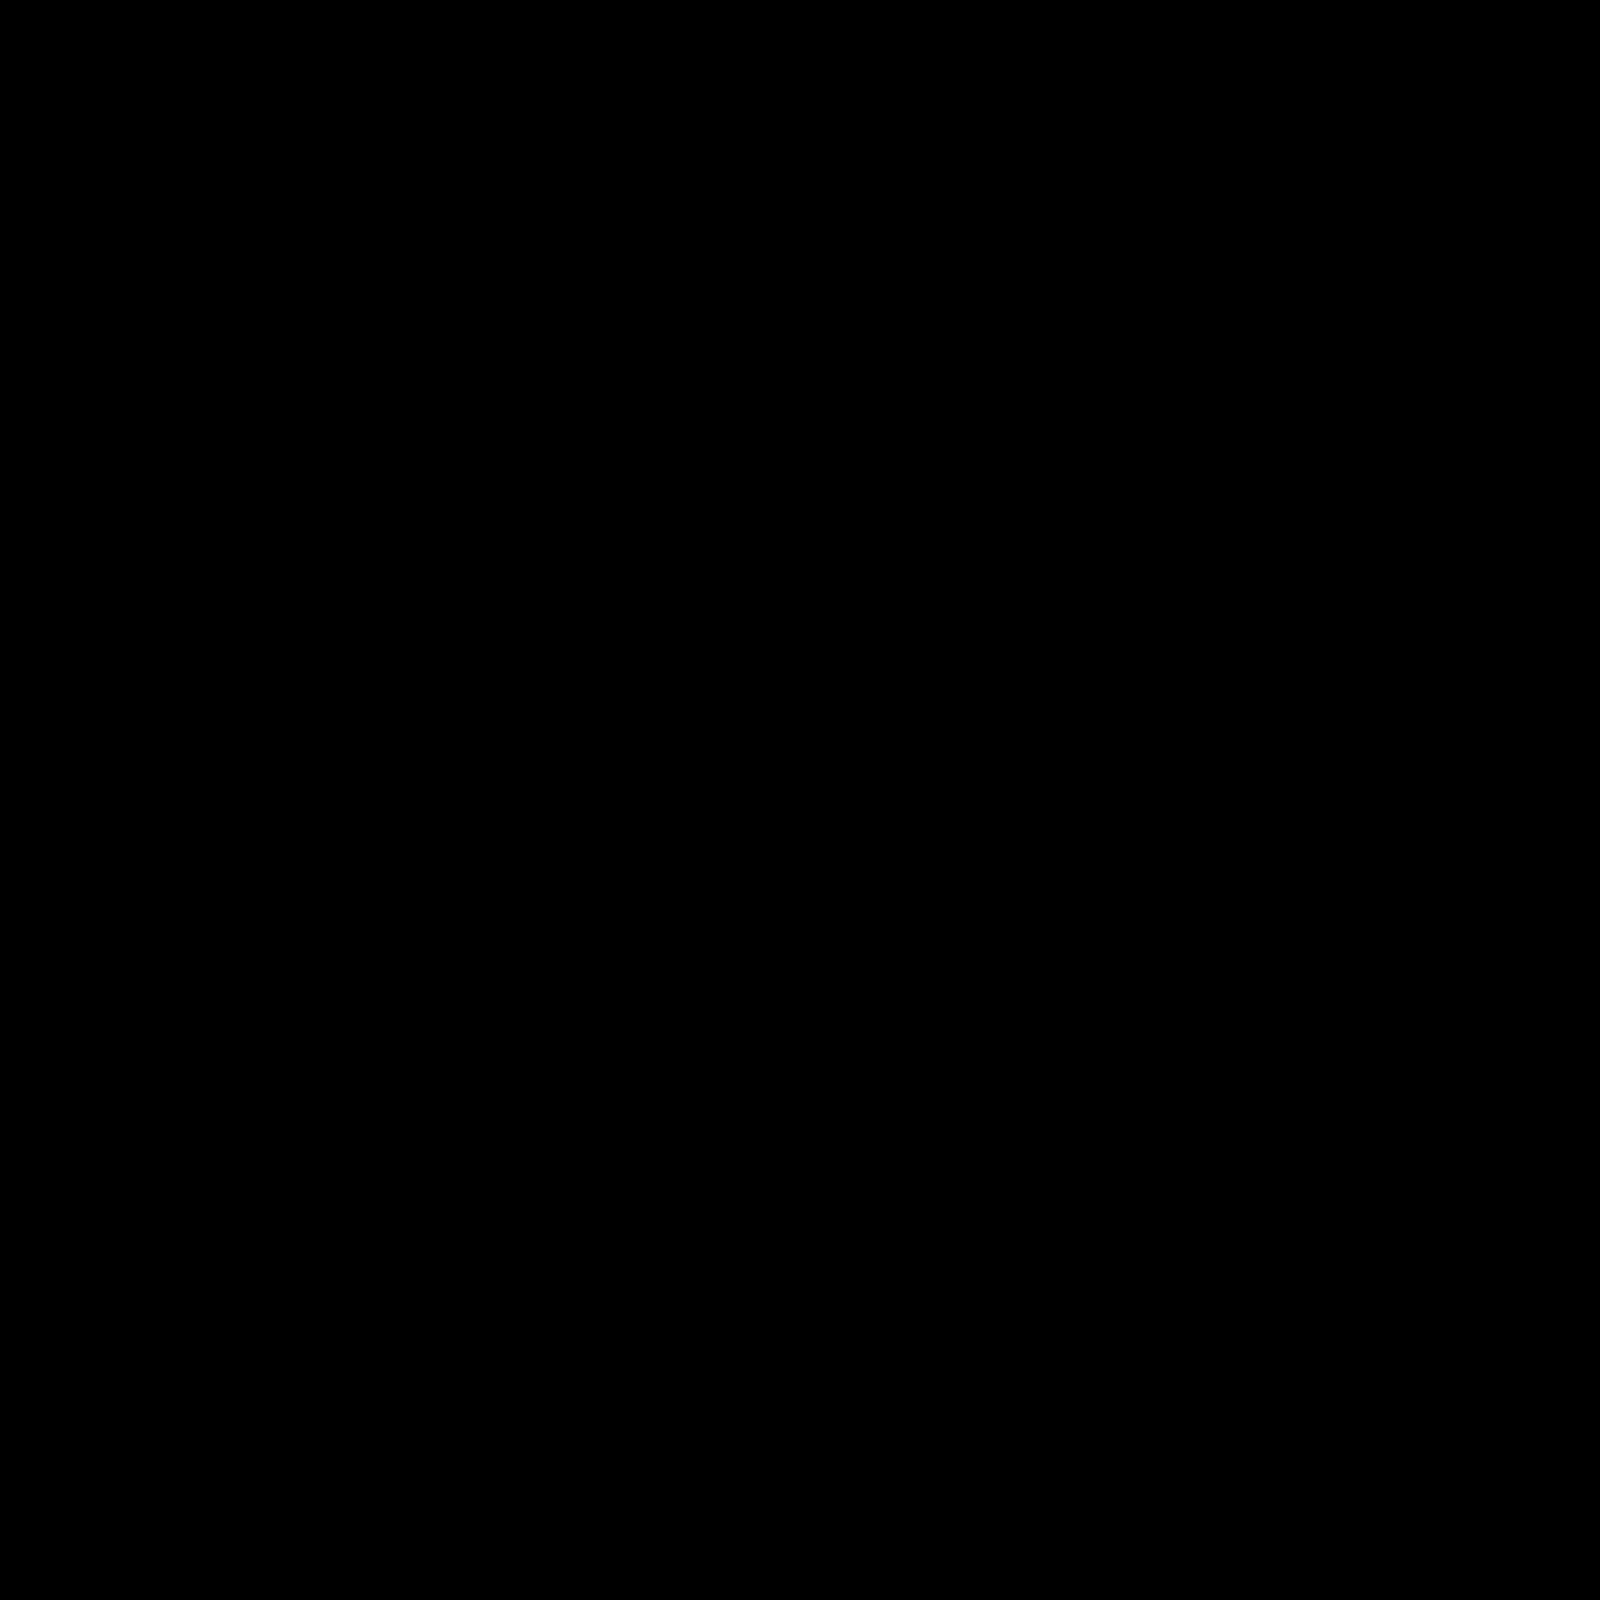 Ластик icon